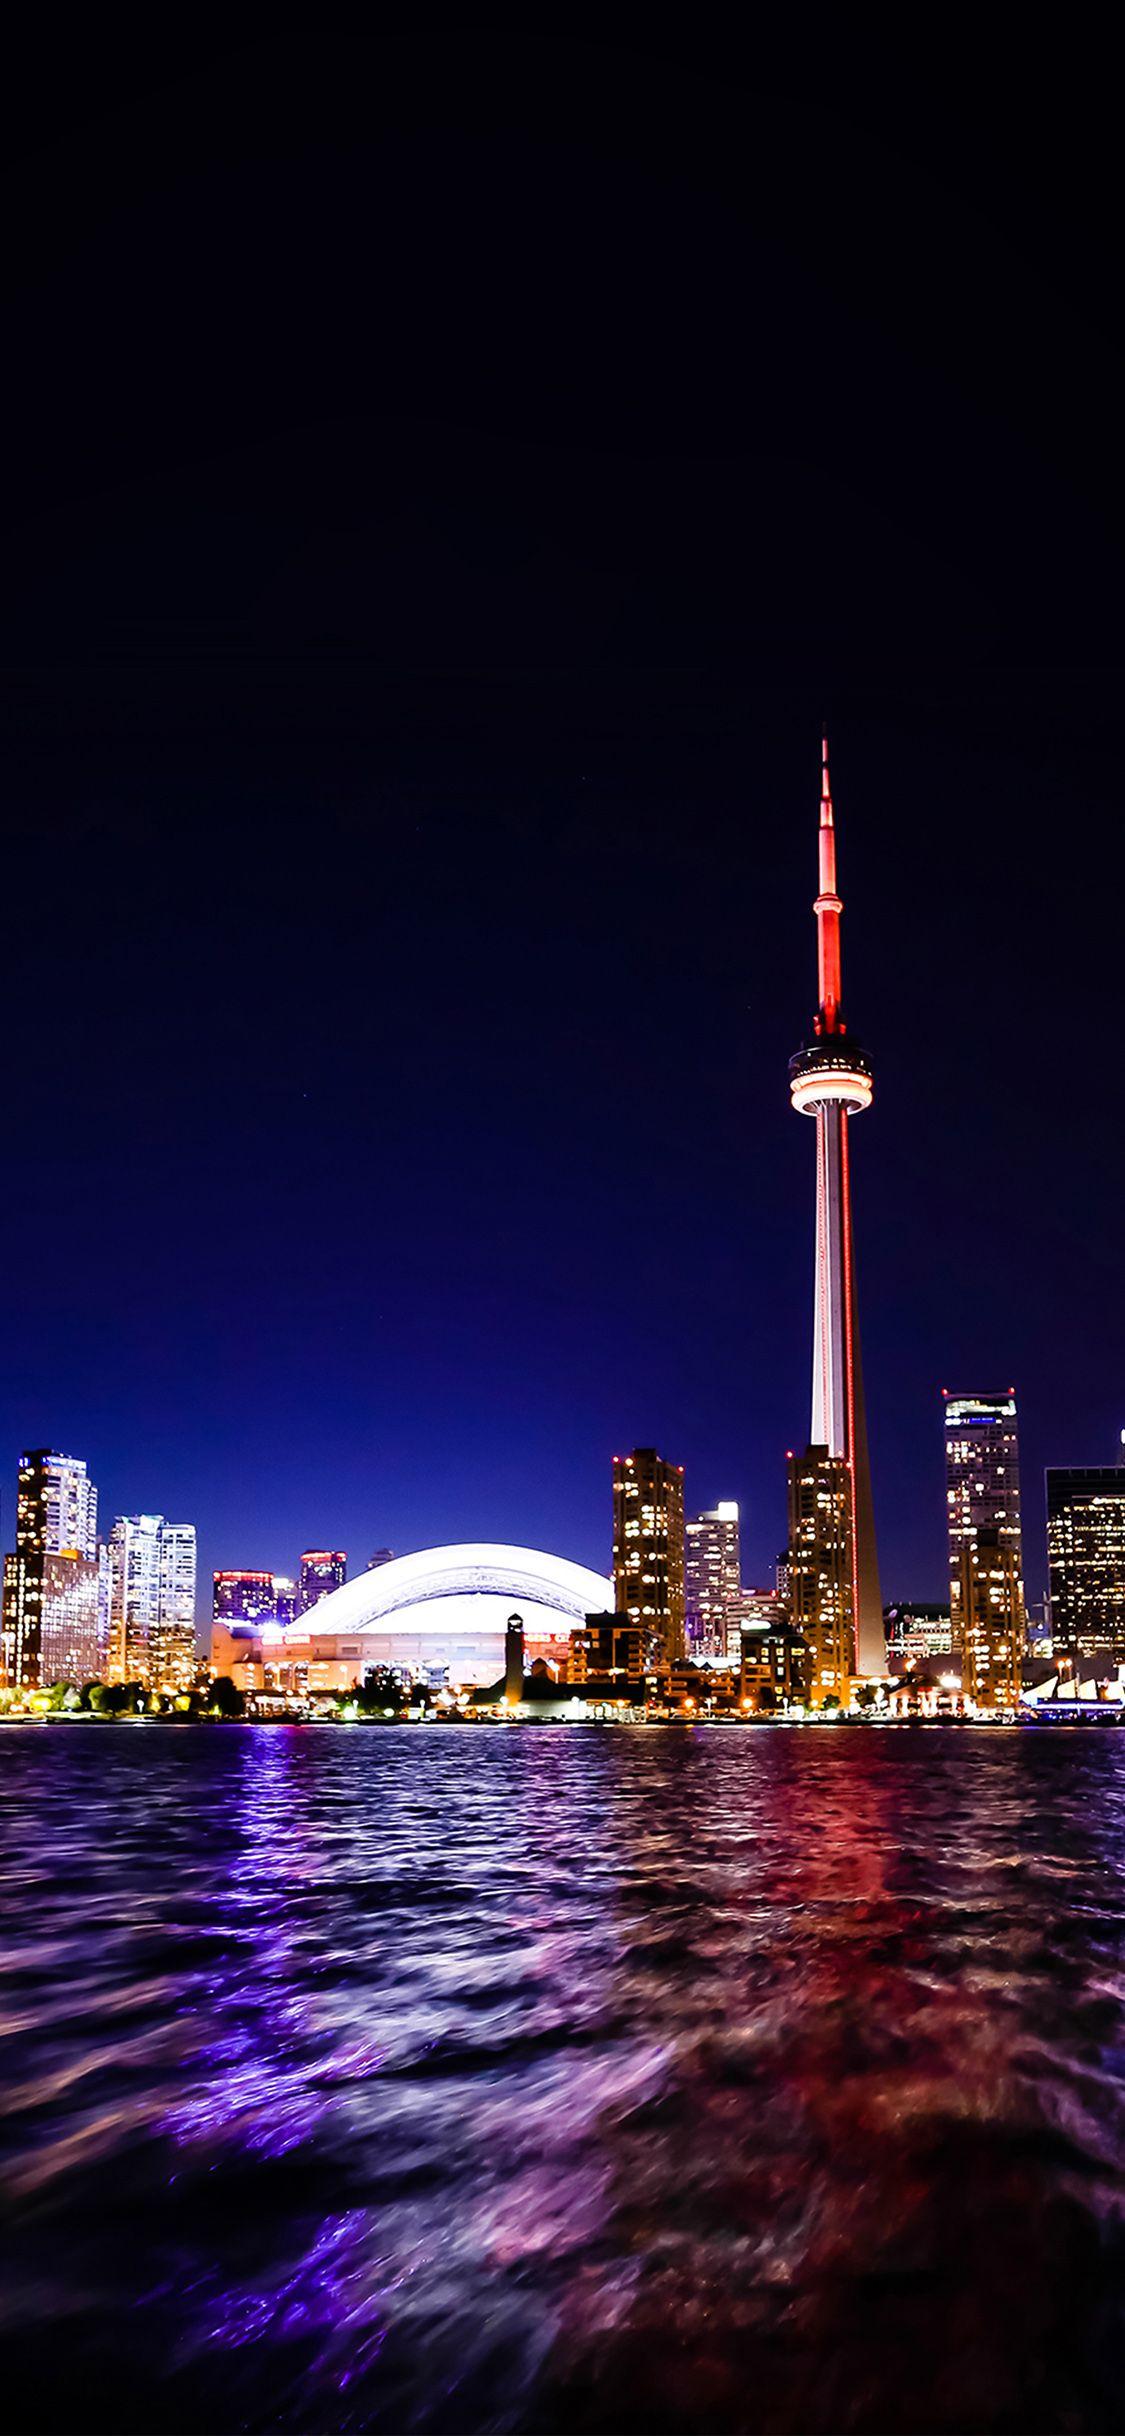 Toronto City Night Iphone X Wallpaper Toronto City Toronto Skyline Canada City